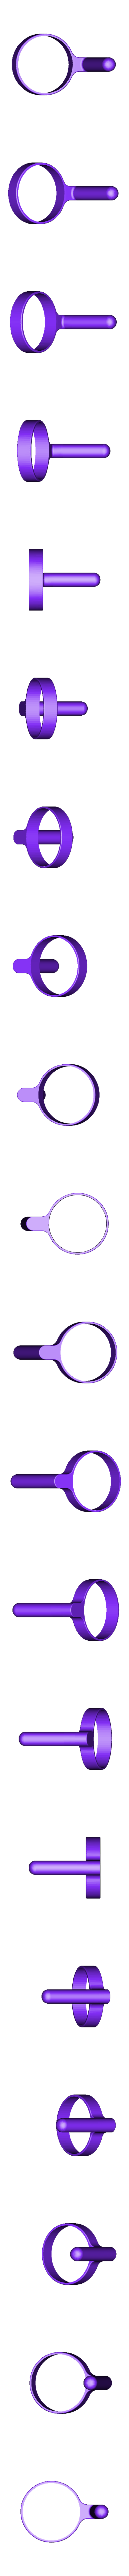 RTIC_30oz_Tumbler_Handle.stl Download free STL file New Style RTIC 30oz Tumbler Handle • Model to 3D print, hanselcj